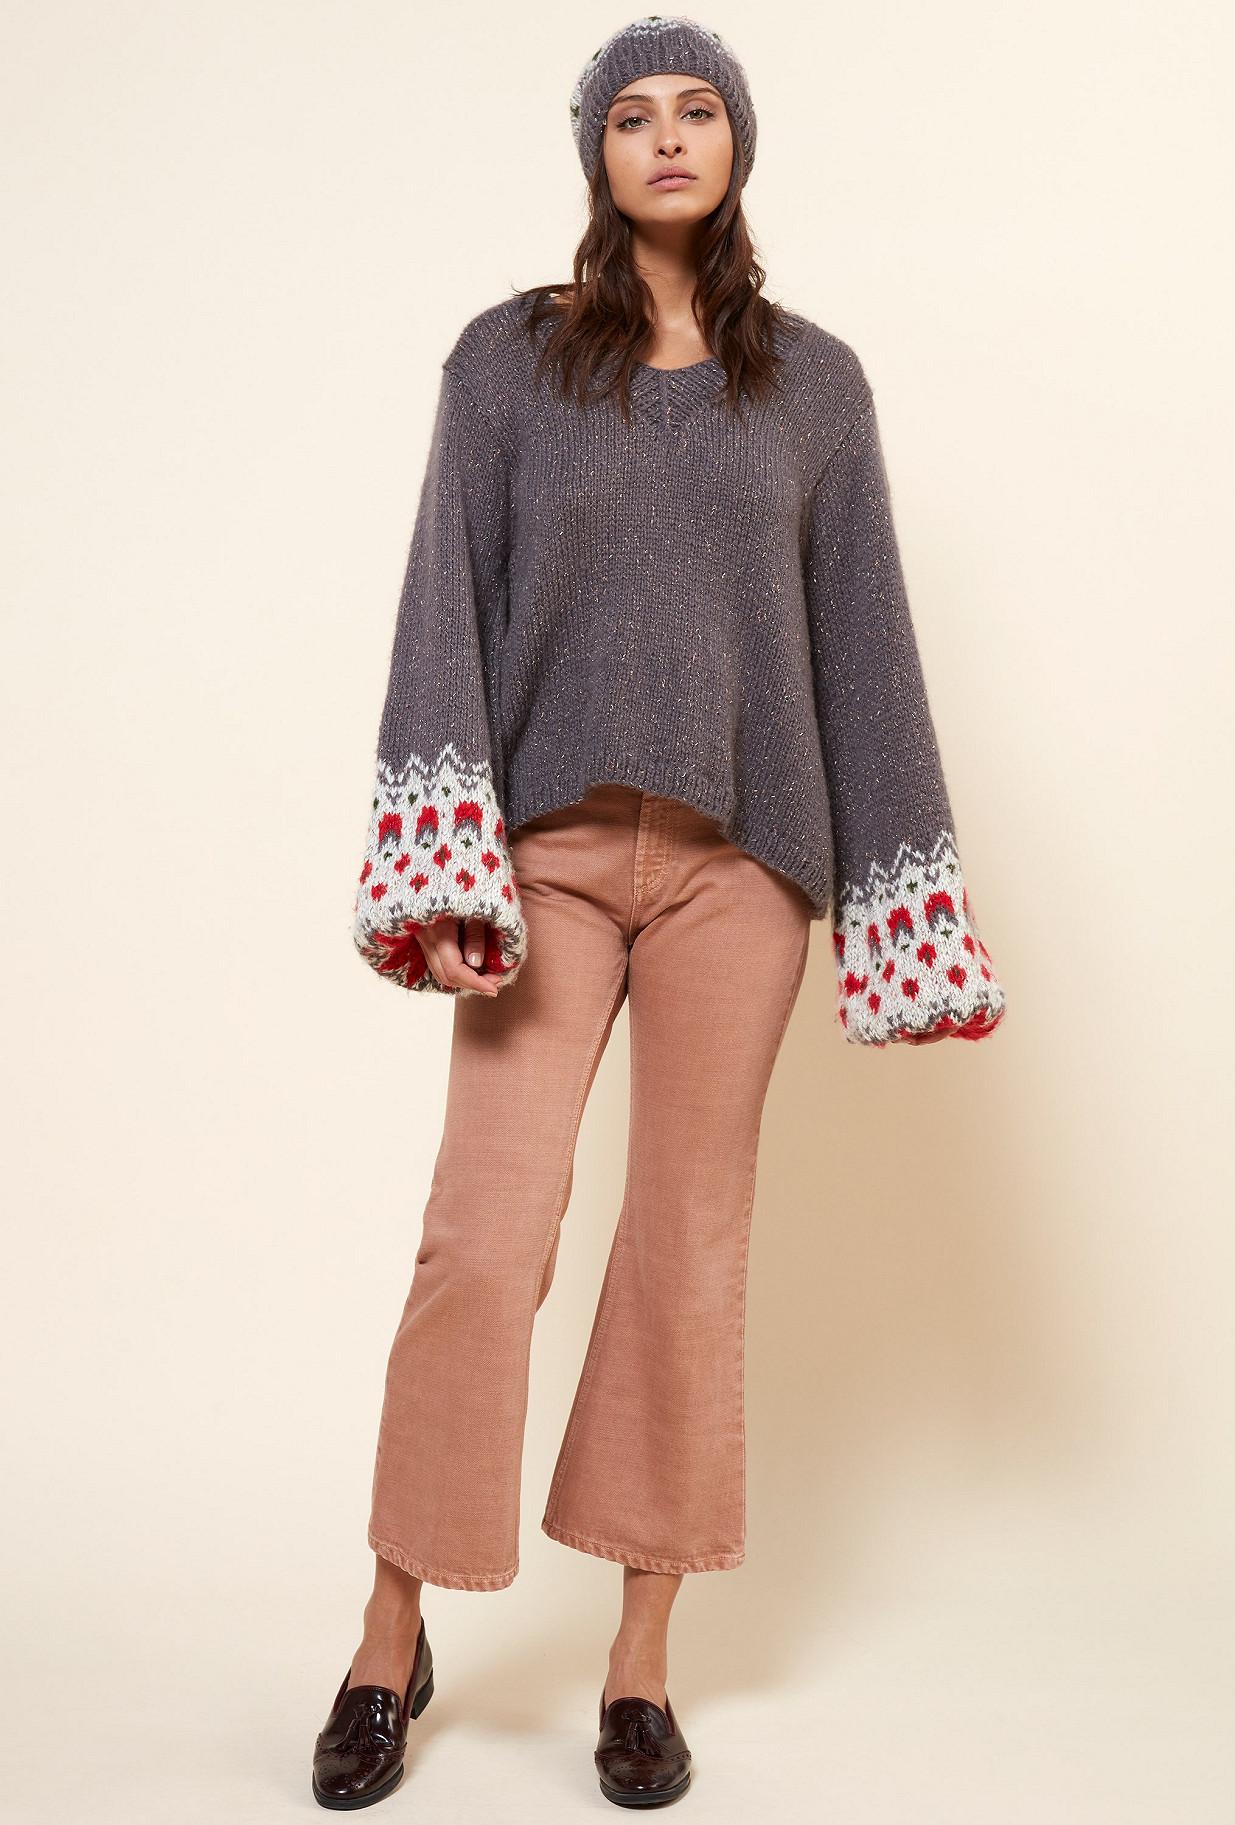 Grey  Knit  Cirano Mes demoiselles fashion clothes designer Paris